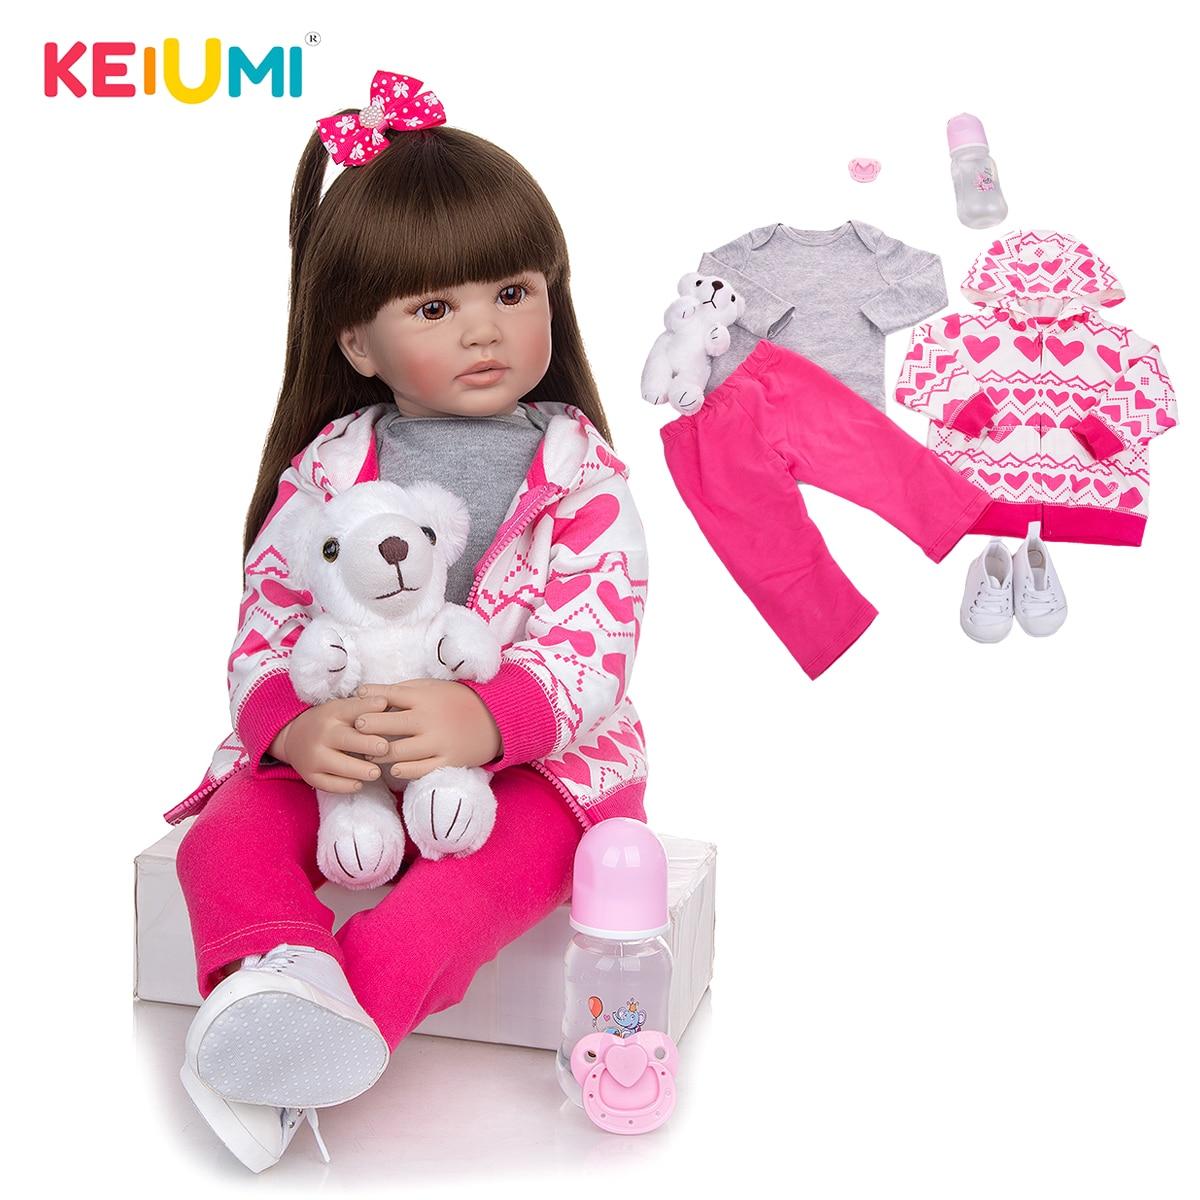 kieumi-24-inch-reborn-baby-dolls-60-cm-models-lifelike-princess-reborn-menina-for-kids-birthday-party-gifts-playmates